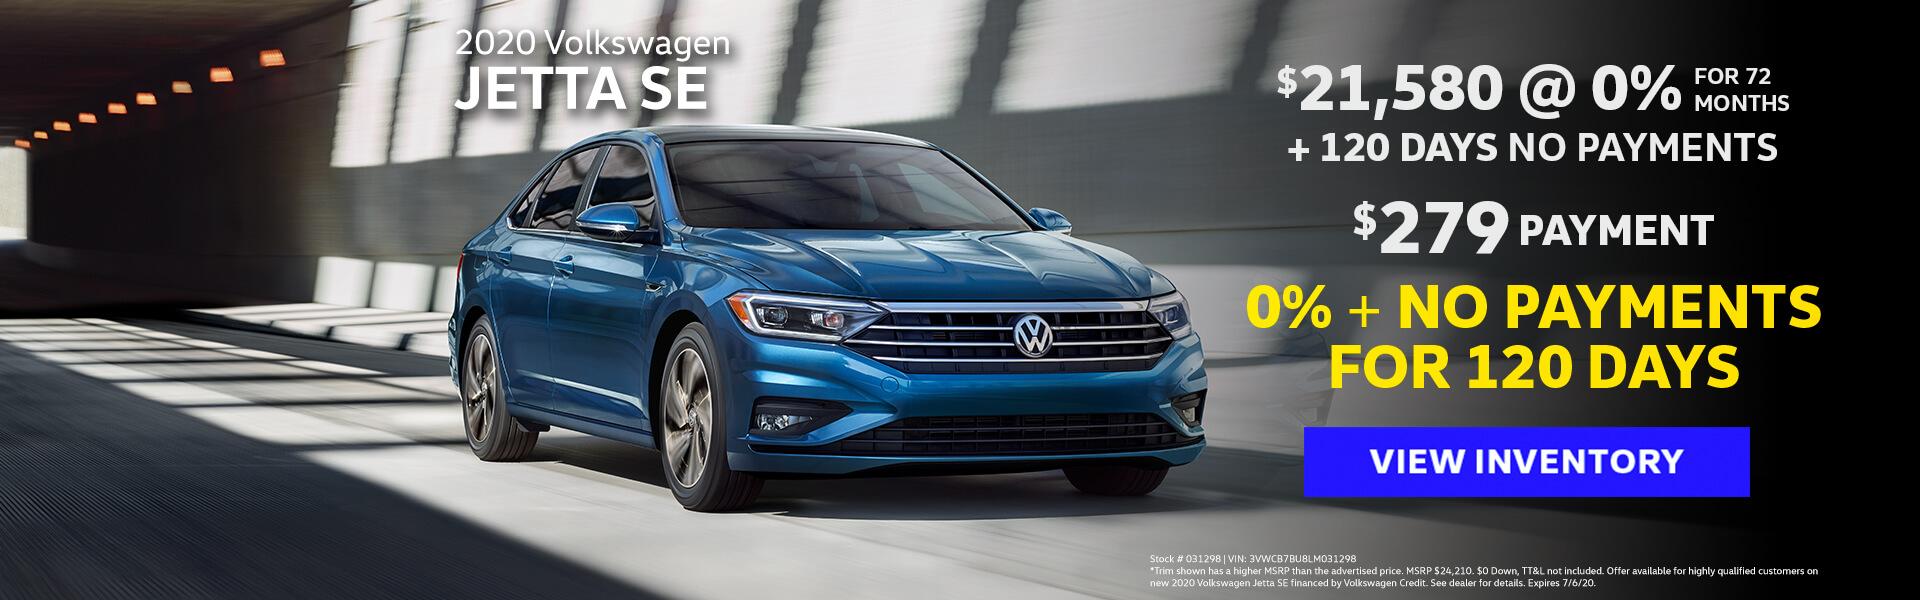 VW Jetta Offer